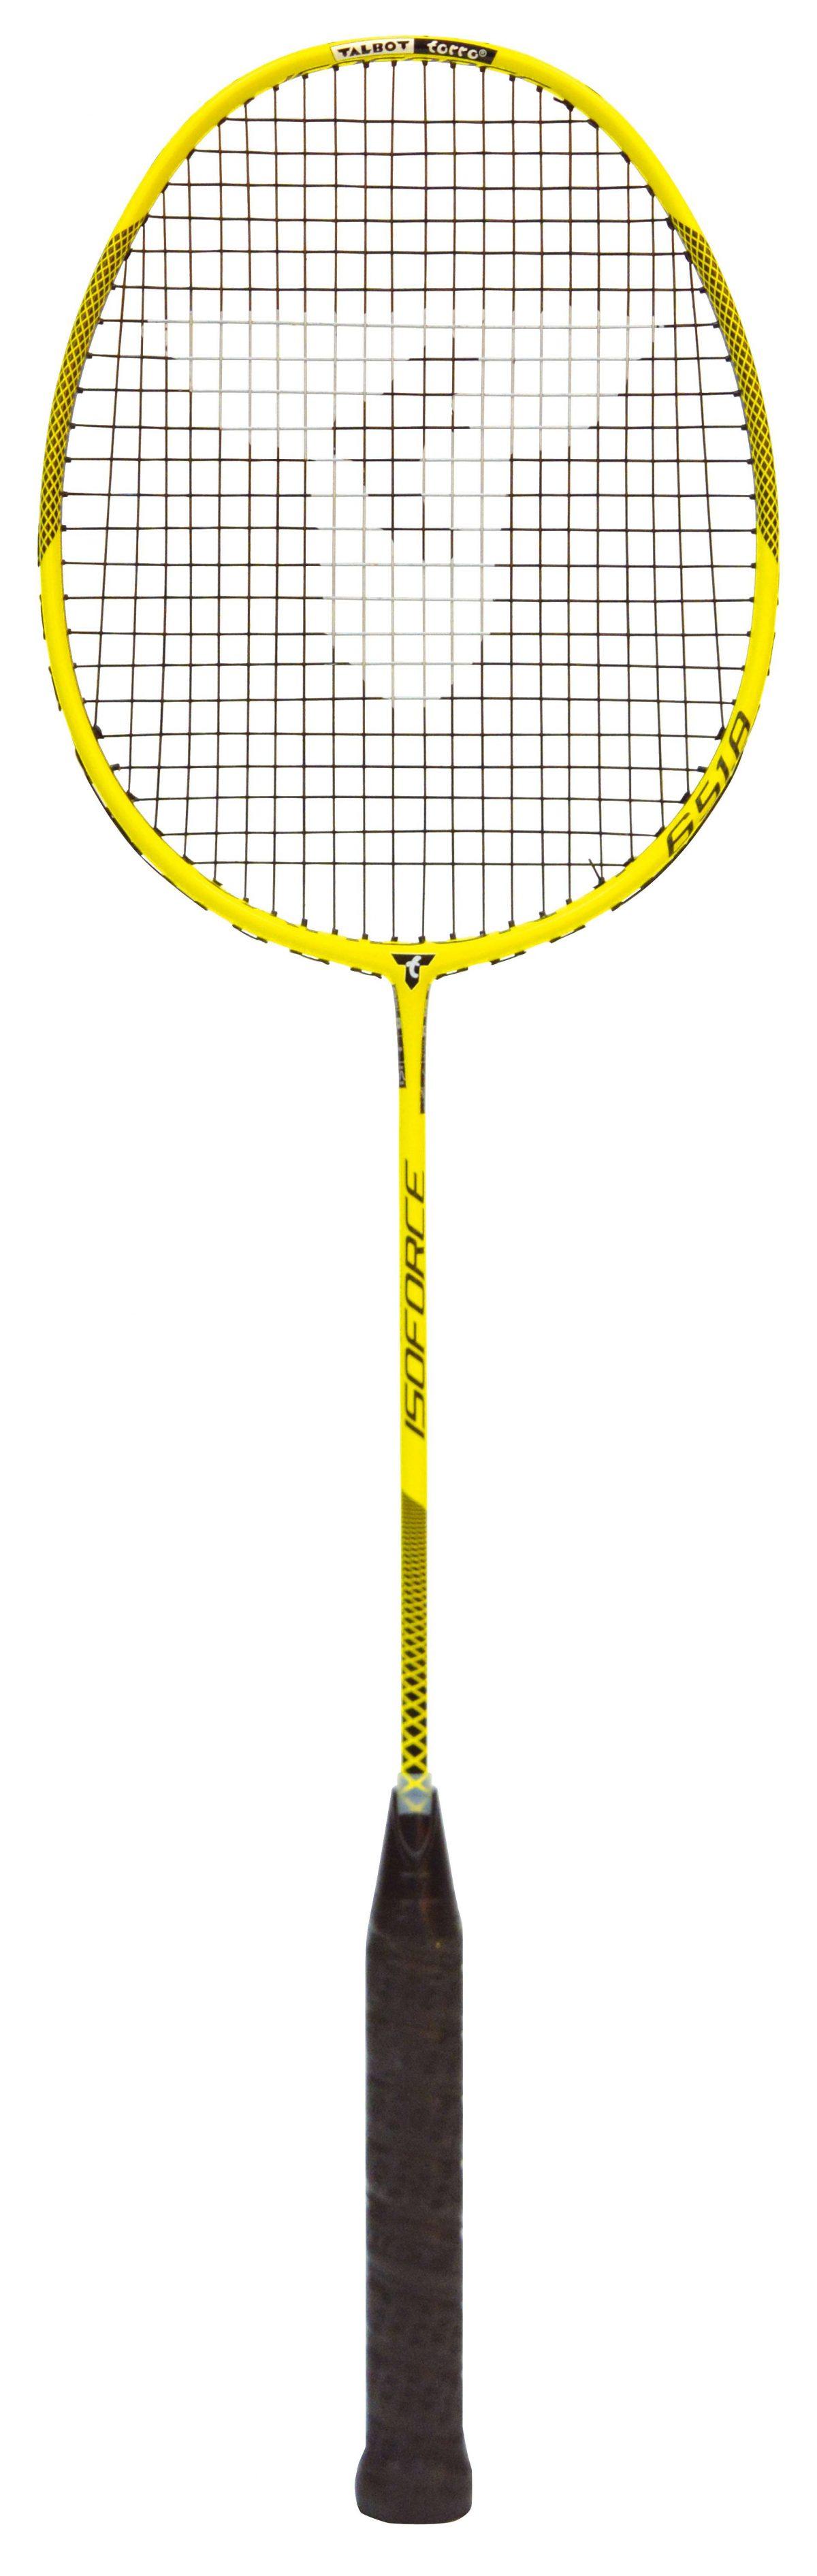 "Talbot Torro Badmintonschläger ""Isoforce 651.8"" - Teamsport - Talbot torro"